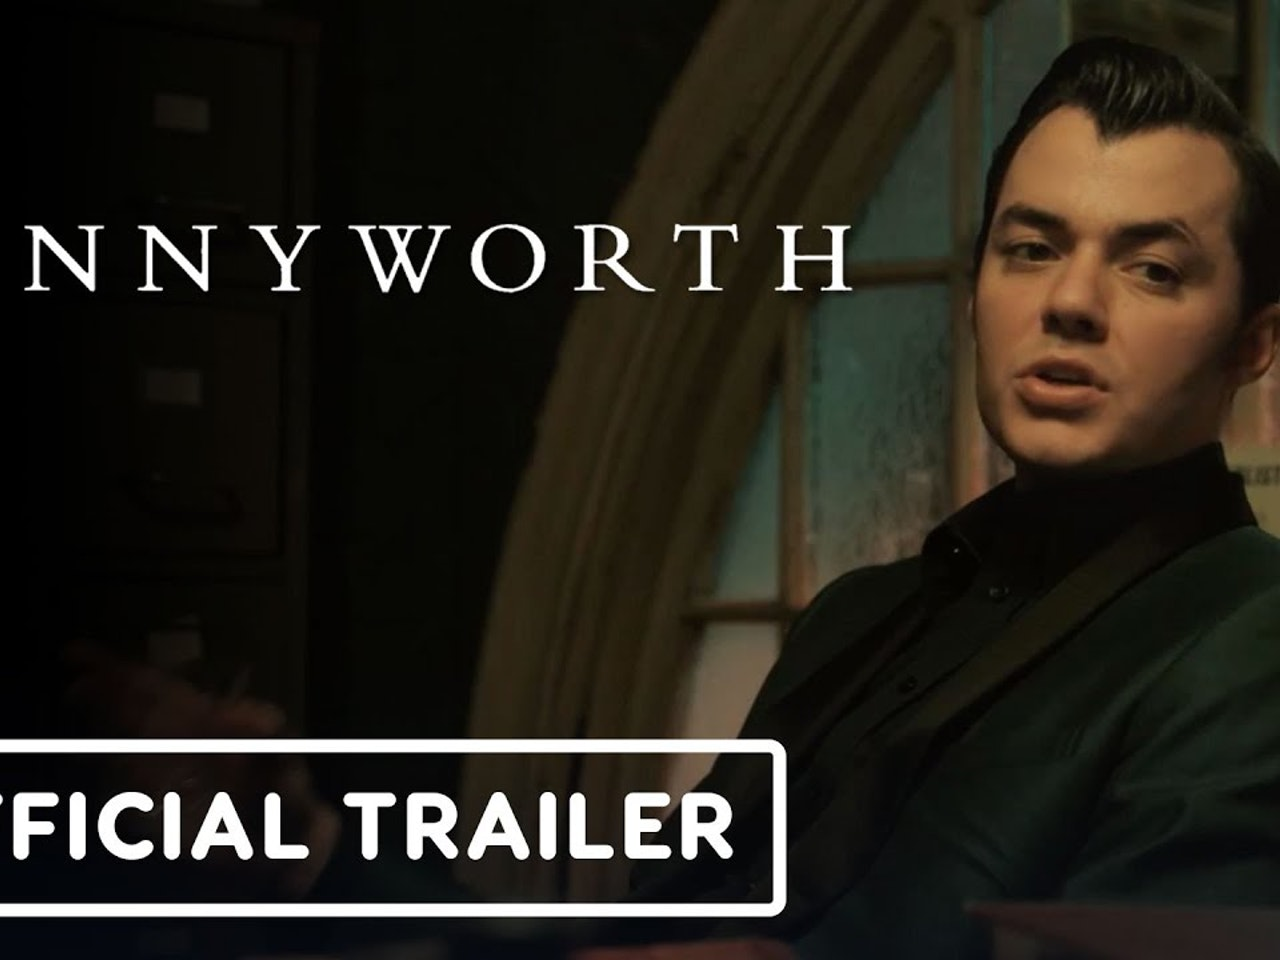 Pennyworth: Season 2 - Official Trailer